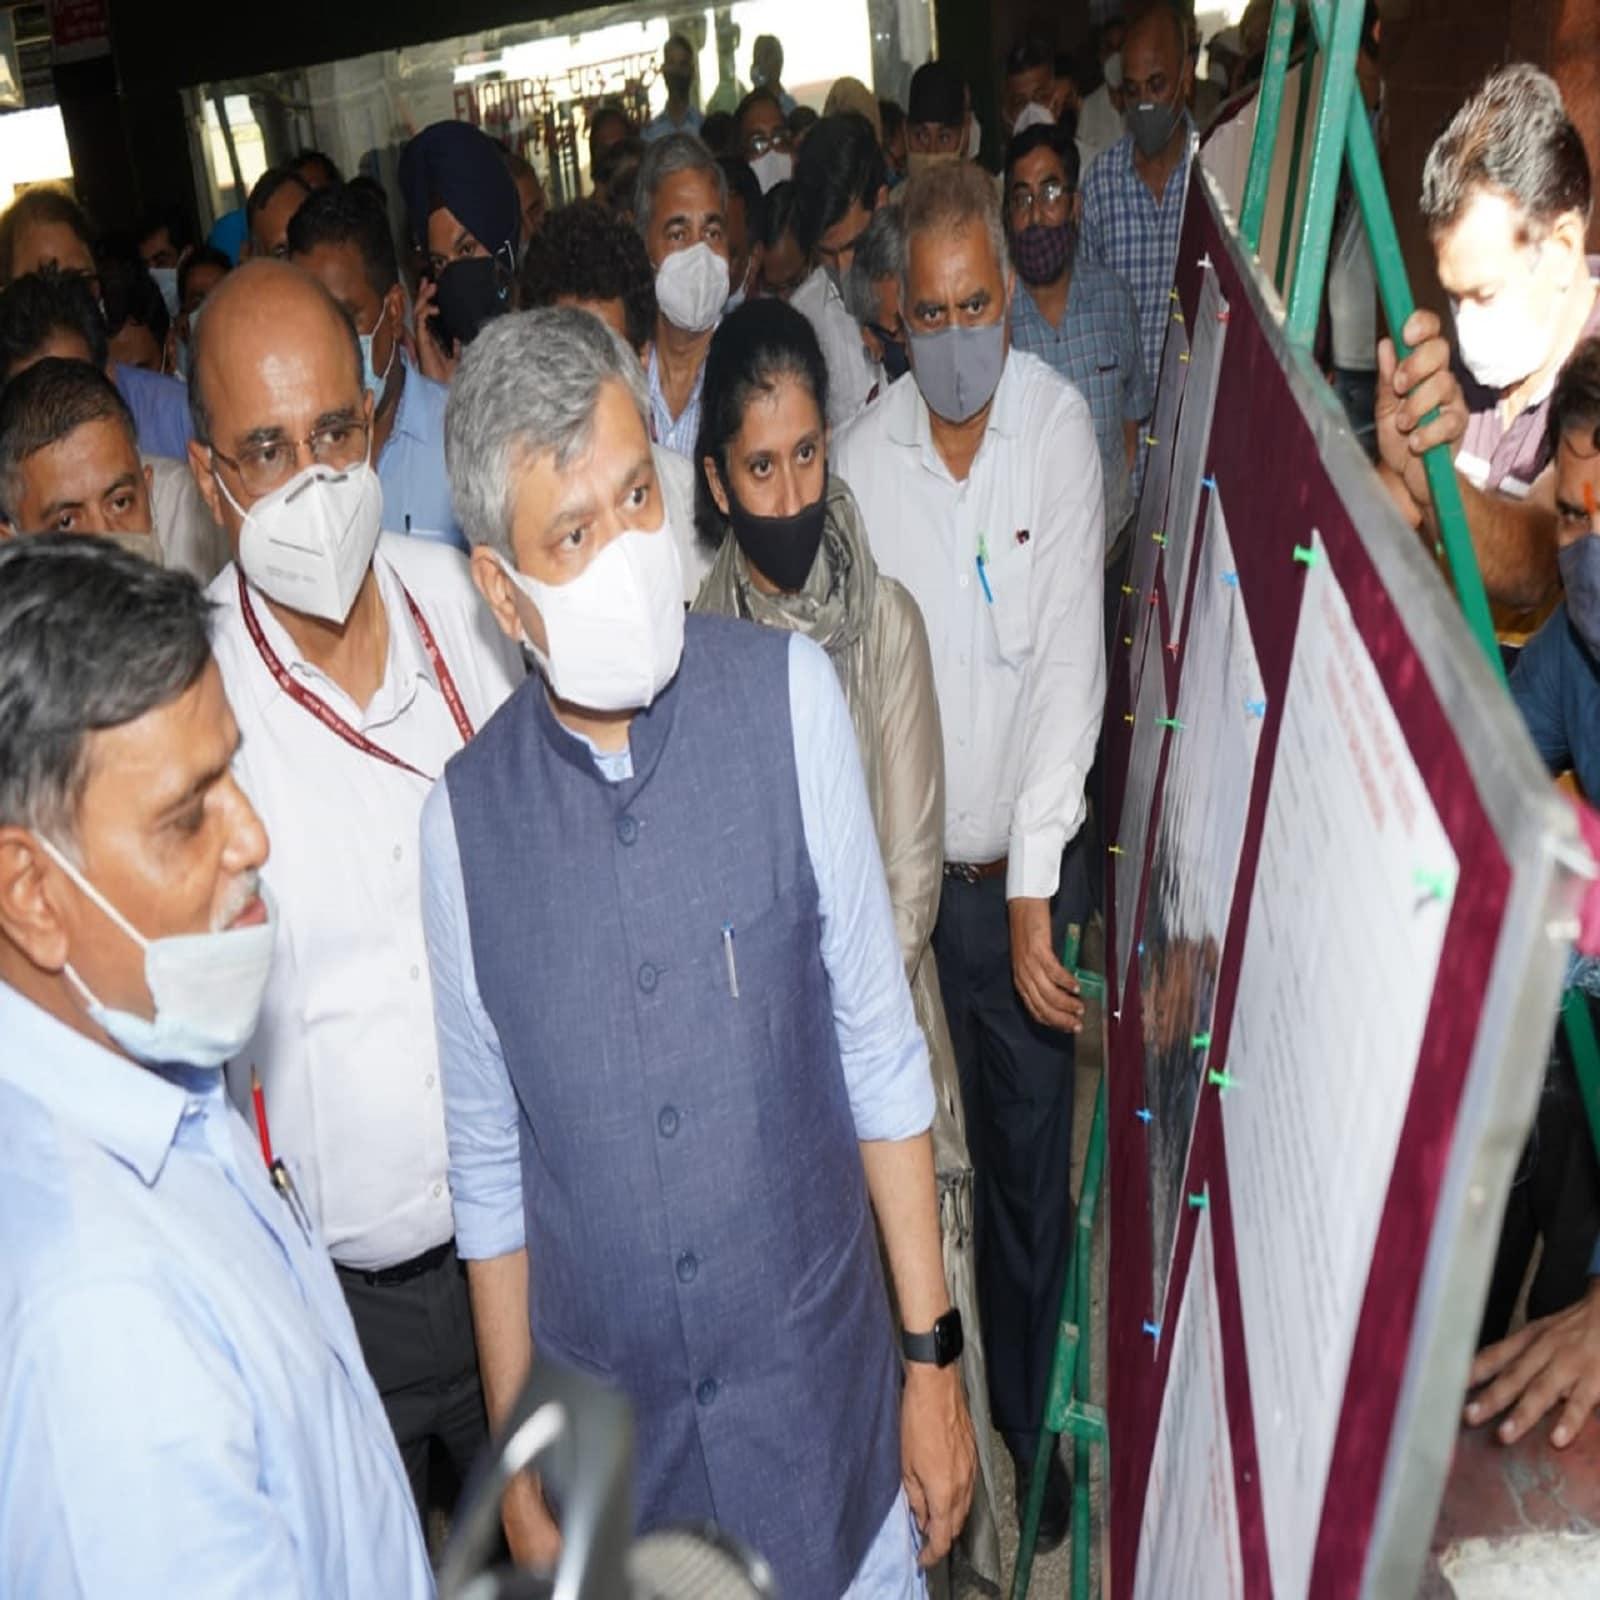 Railway Minister Ashwini Vaishnav gave instructions to rapidly expand the facilities at Katra station.  Indian Railways, Udhampur-Srinagar-Baramulla Rail Link Project, Shri Mata Vaishno Devi Katra Station, Semi High Speed, Vande Bharat Express, Ashwini Vaishnav, Katra-Banihal, Chenab Bridge, Anji Bridge, Indian Railways, USBRL Project, Udhampur-Srinagar- Baramulla-Rail-Link Project, Ashutosh Gangal, Chenab Bridge, Anji Bridge, Semi-high speed express train, Sri Mata Vaishno Devi Katra Station, Vande Bharat Express, Katra-Banihal, Jammu Tawi station